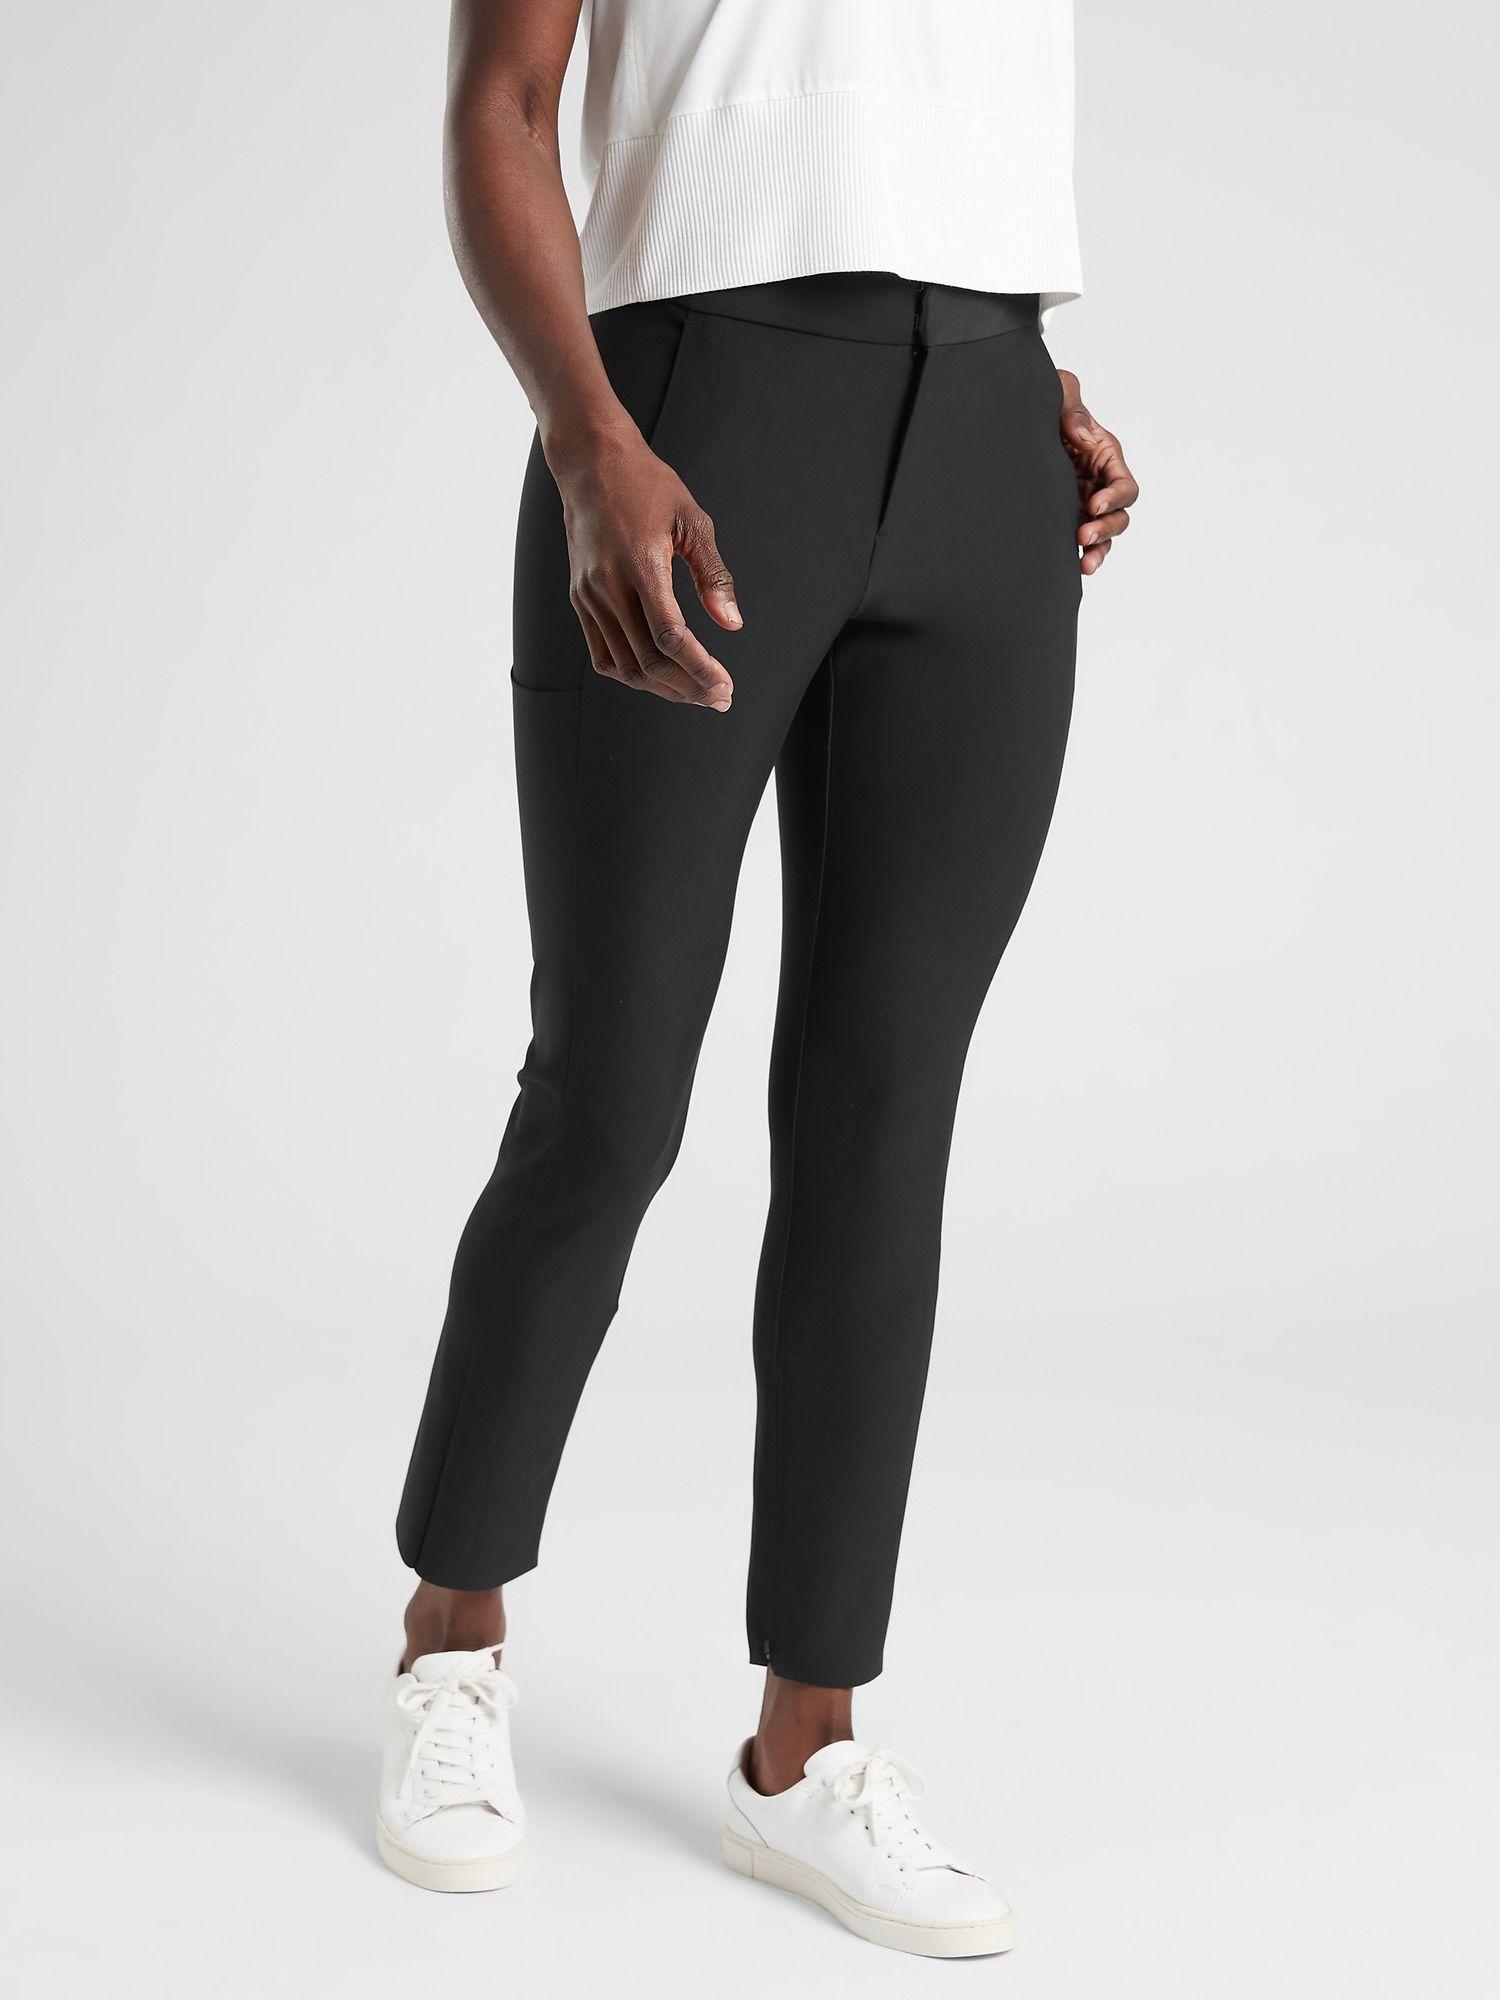 Stellar Trouser Athleta In 2021 Pants For Women Black Pants Work Comfortable Dress Pants [ 2000 x 1500 Pixel ]